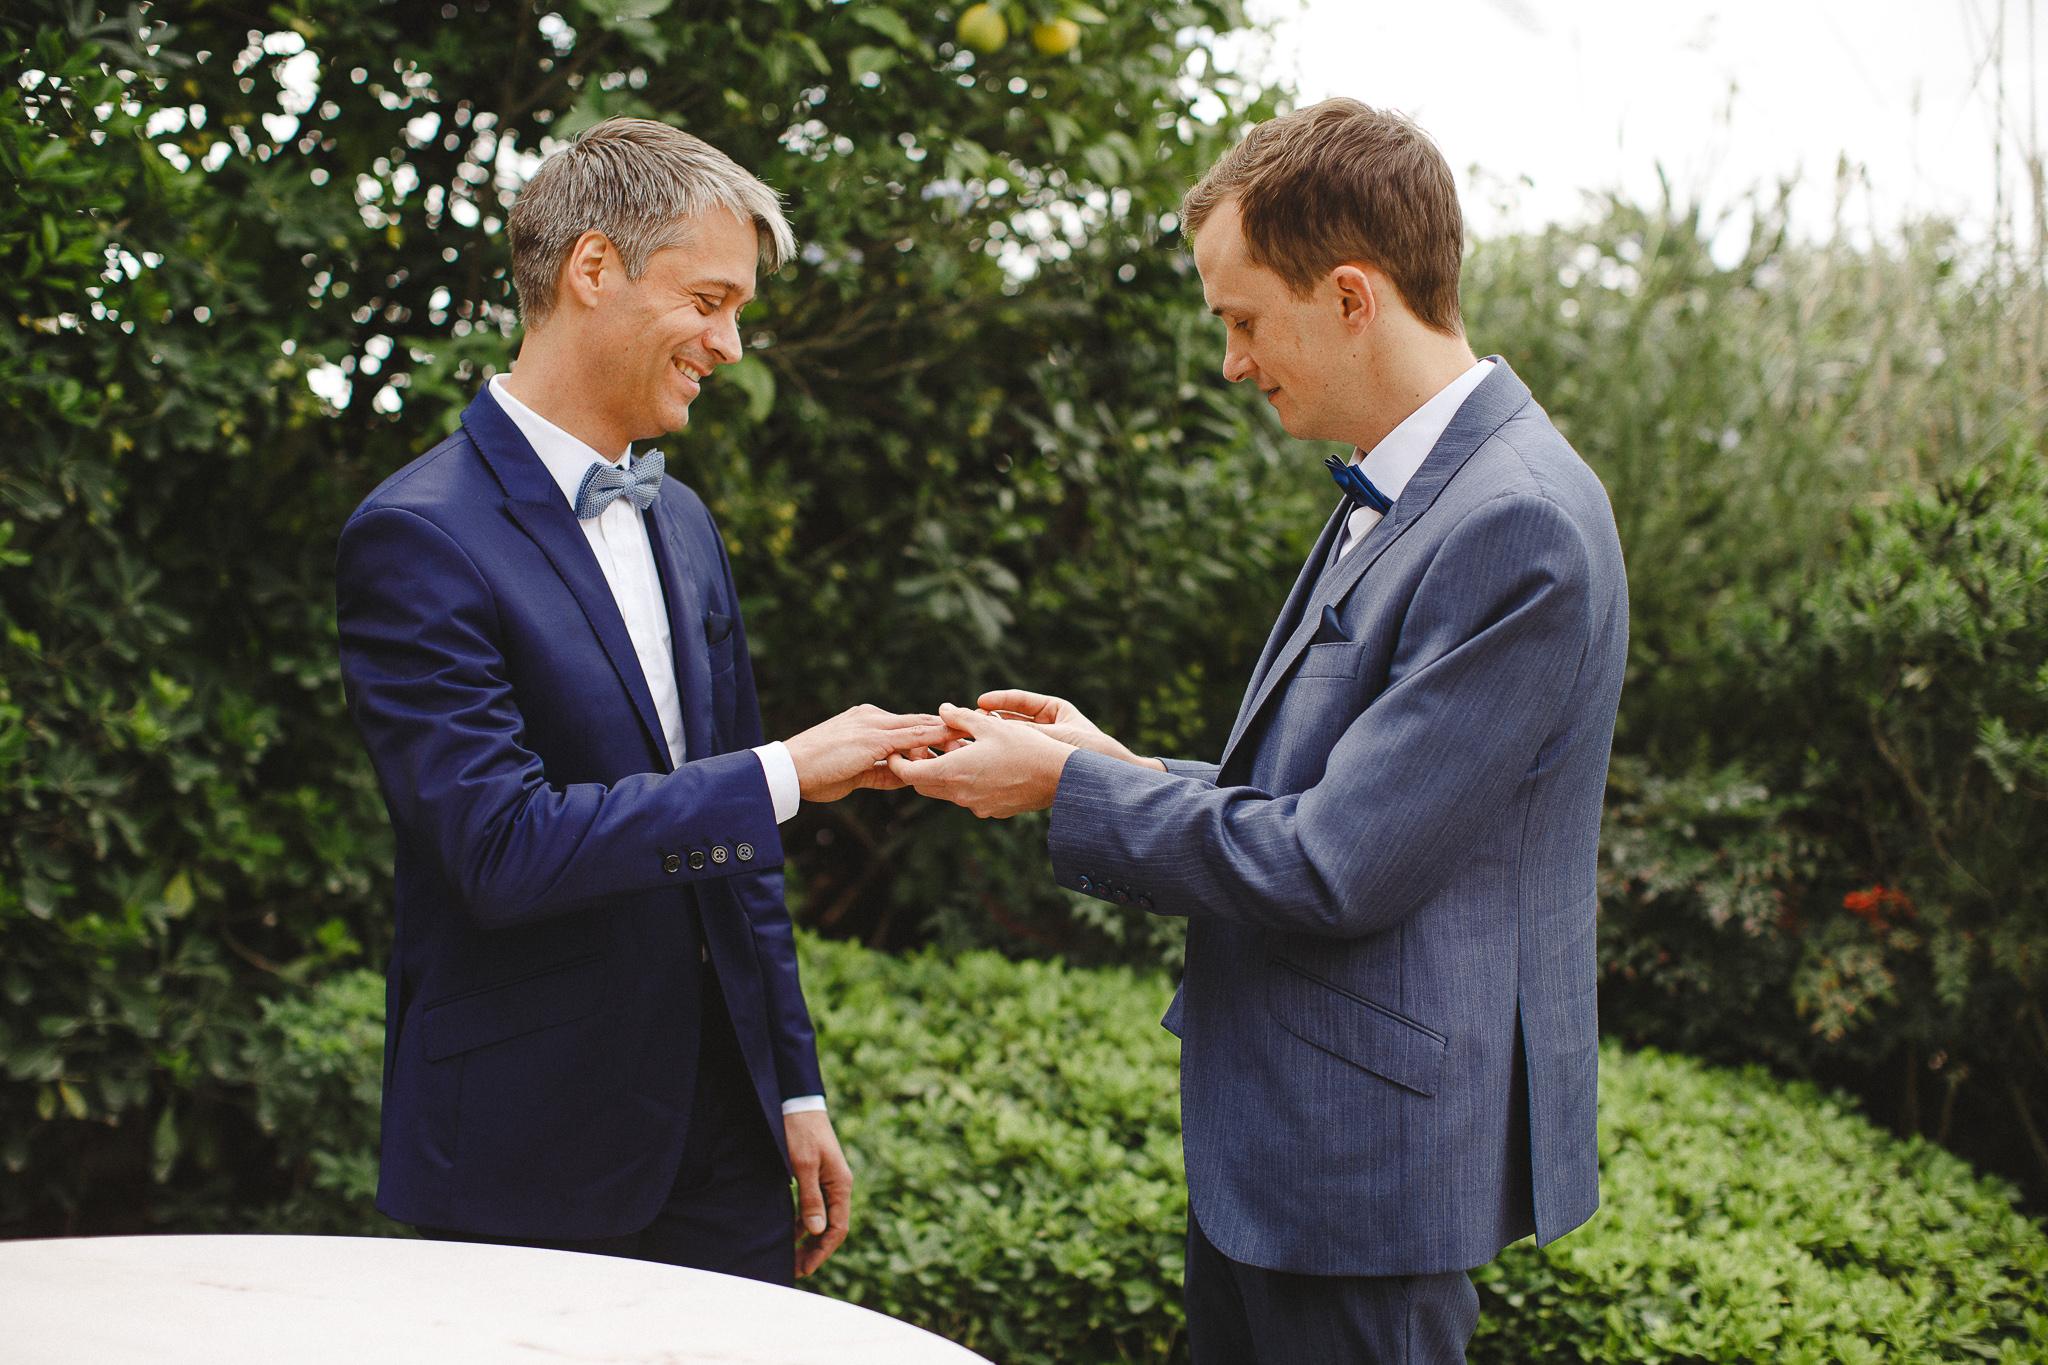 A same-sex wedding in Norwegian Embassy in Lisbon